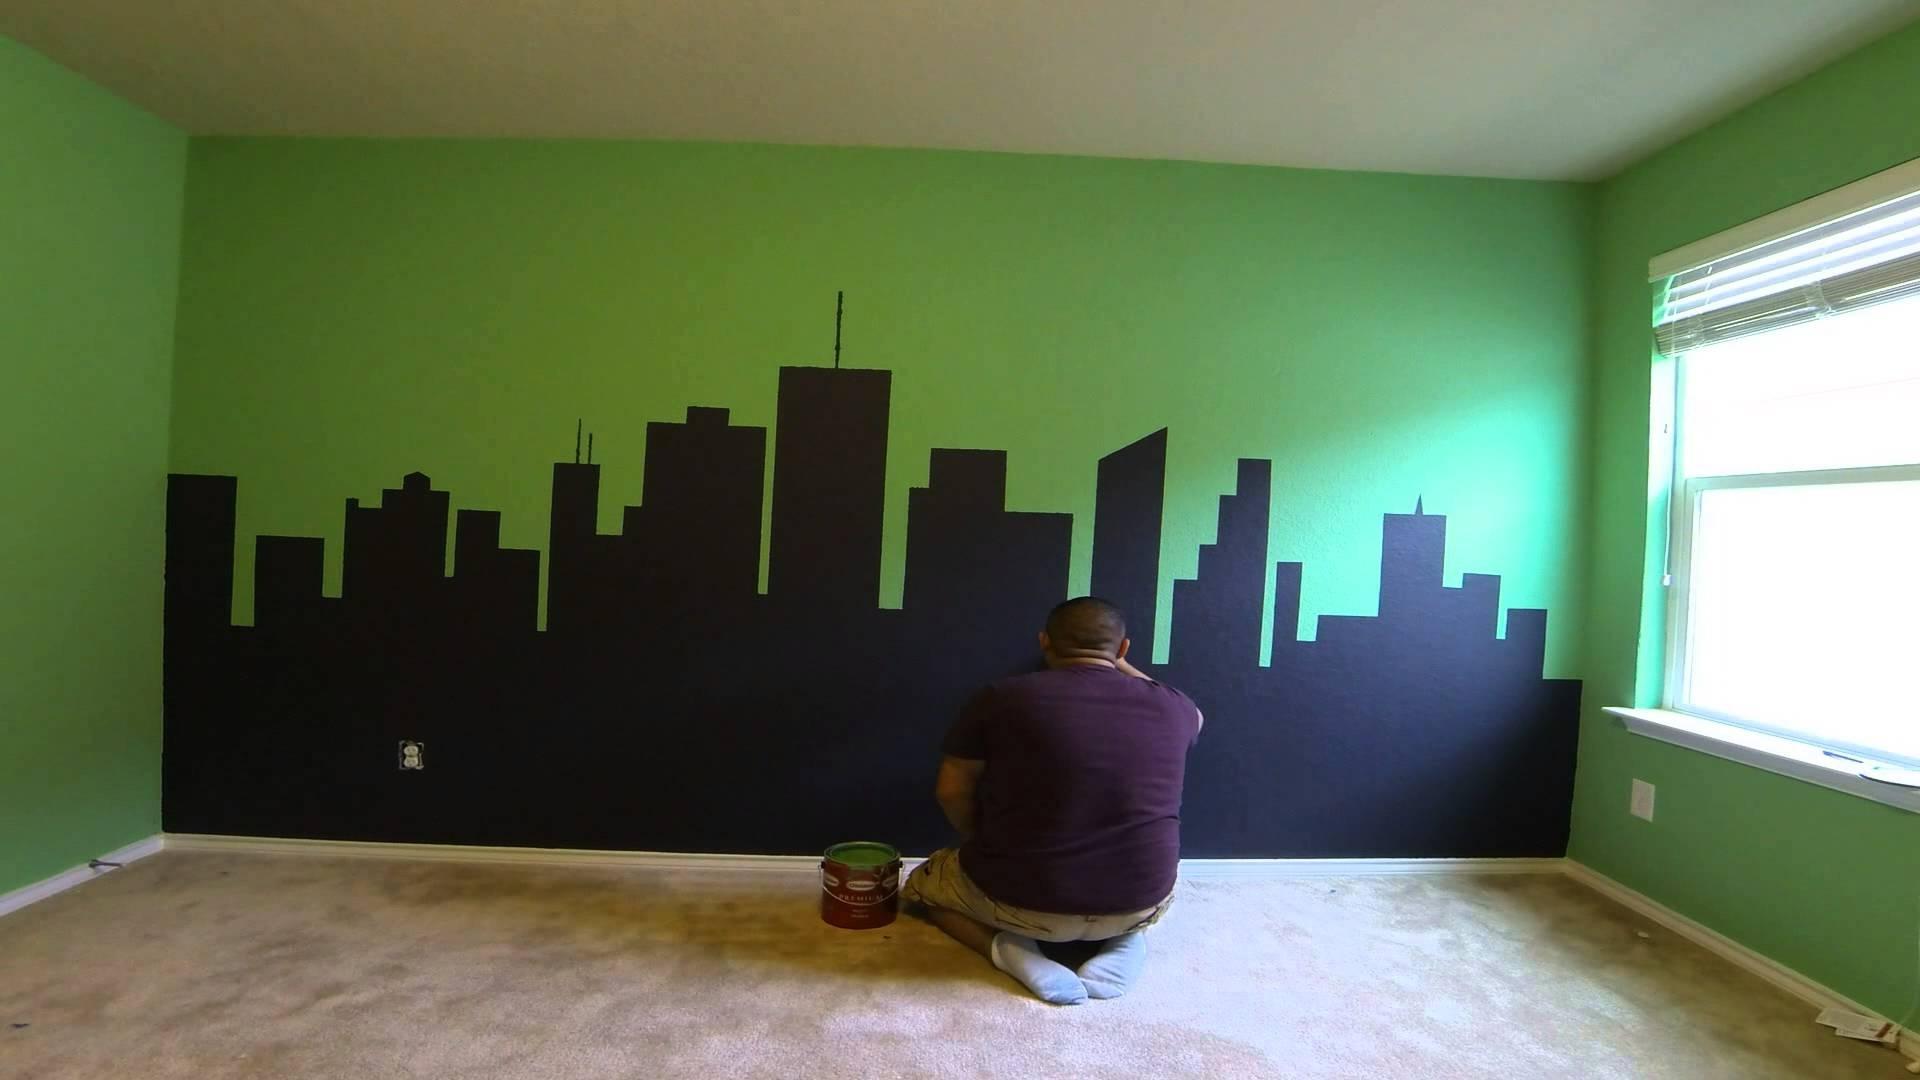 Ninja Turtle Bedroom – Youtube In 2018 Ninja Turtle Wall Art (View 12 of 20)